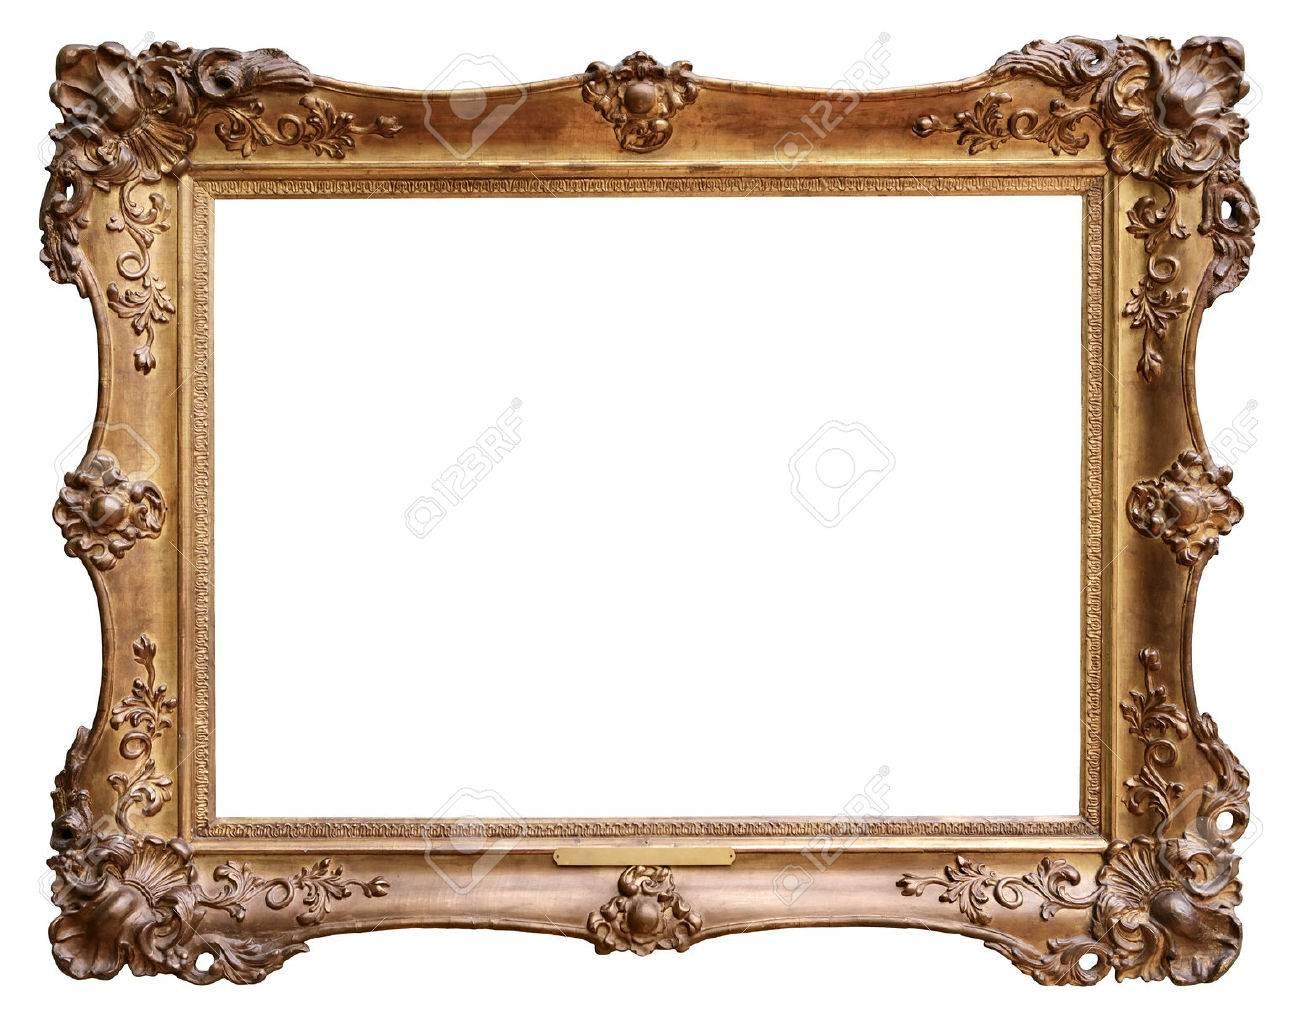 Wooden vintage frame isolated on white background Stock Photo - 48625919